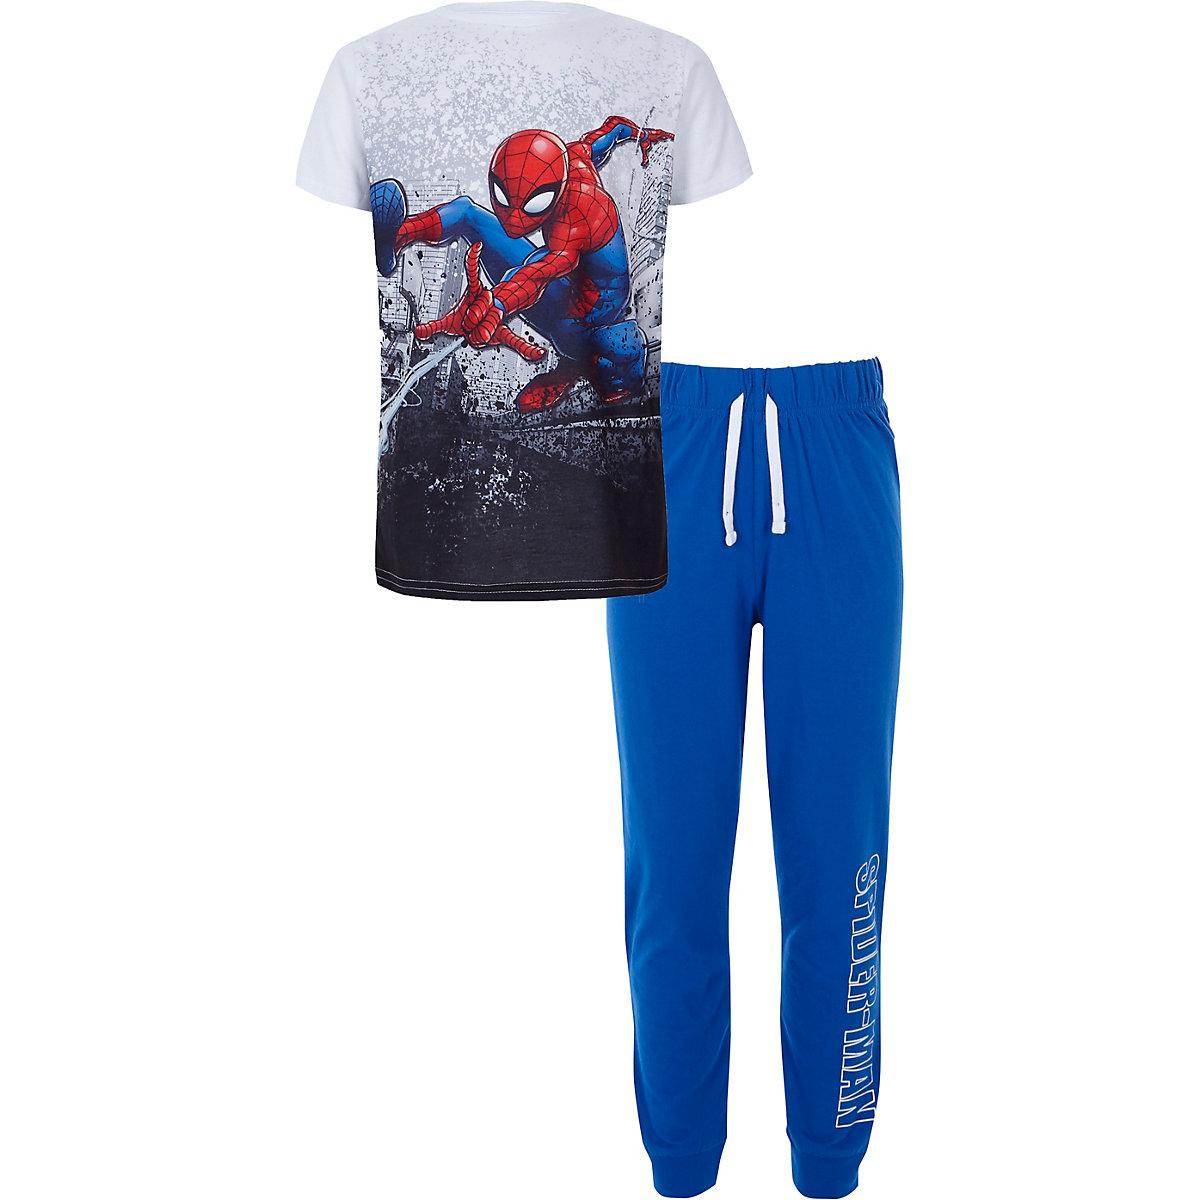 Ensemble pyjama garçon bleu Spider-Man